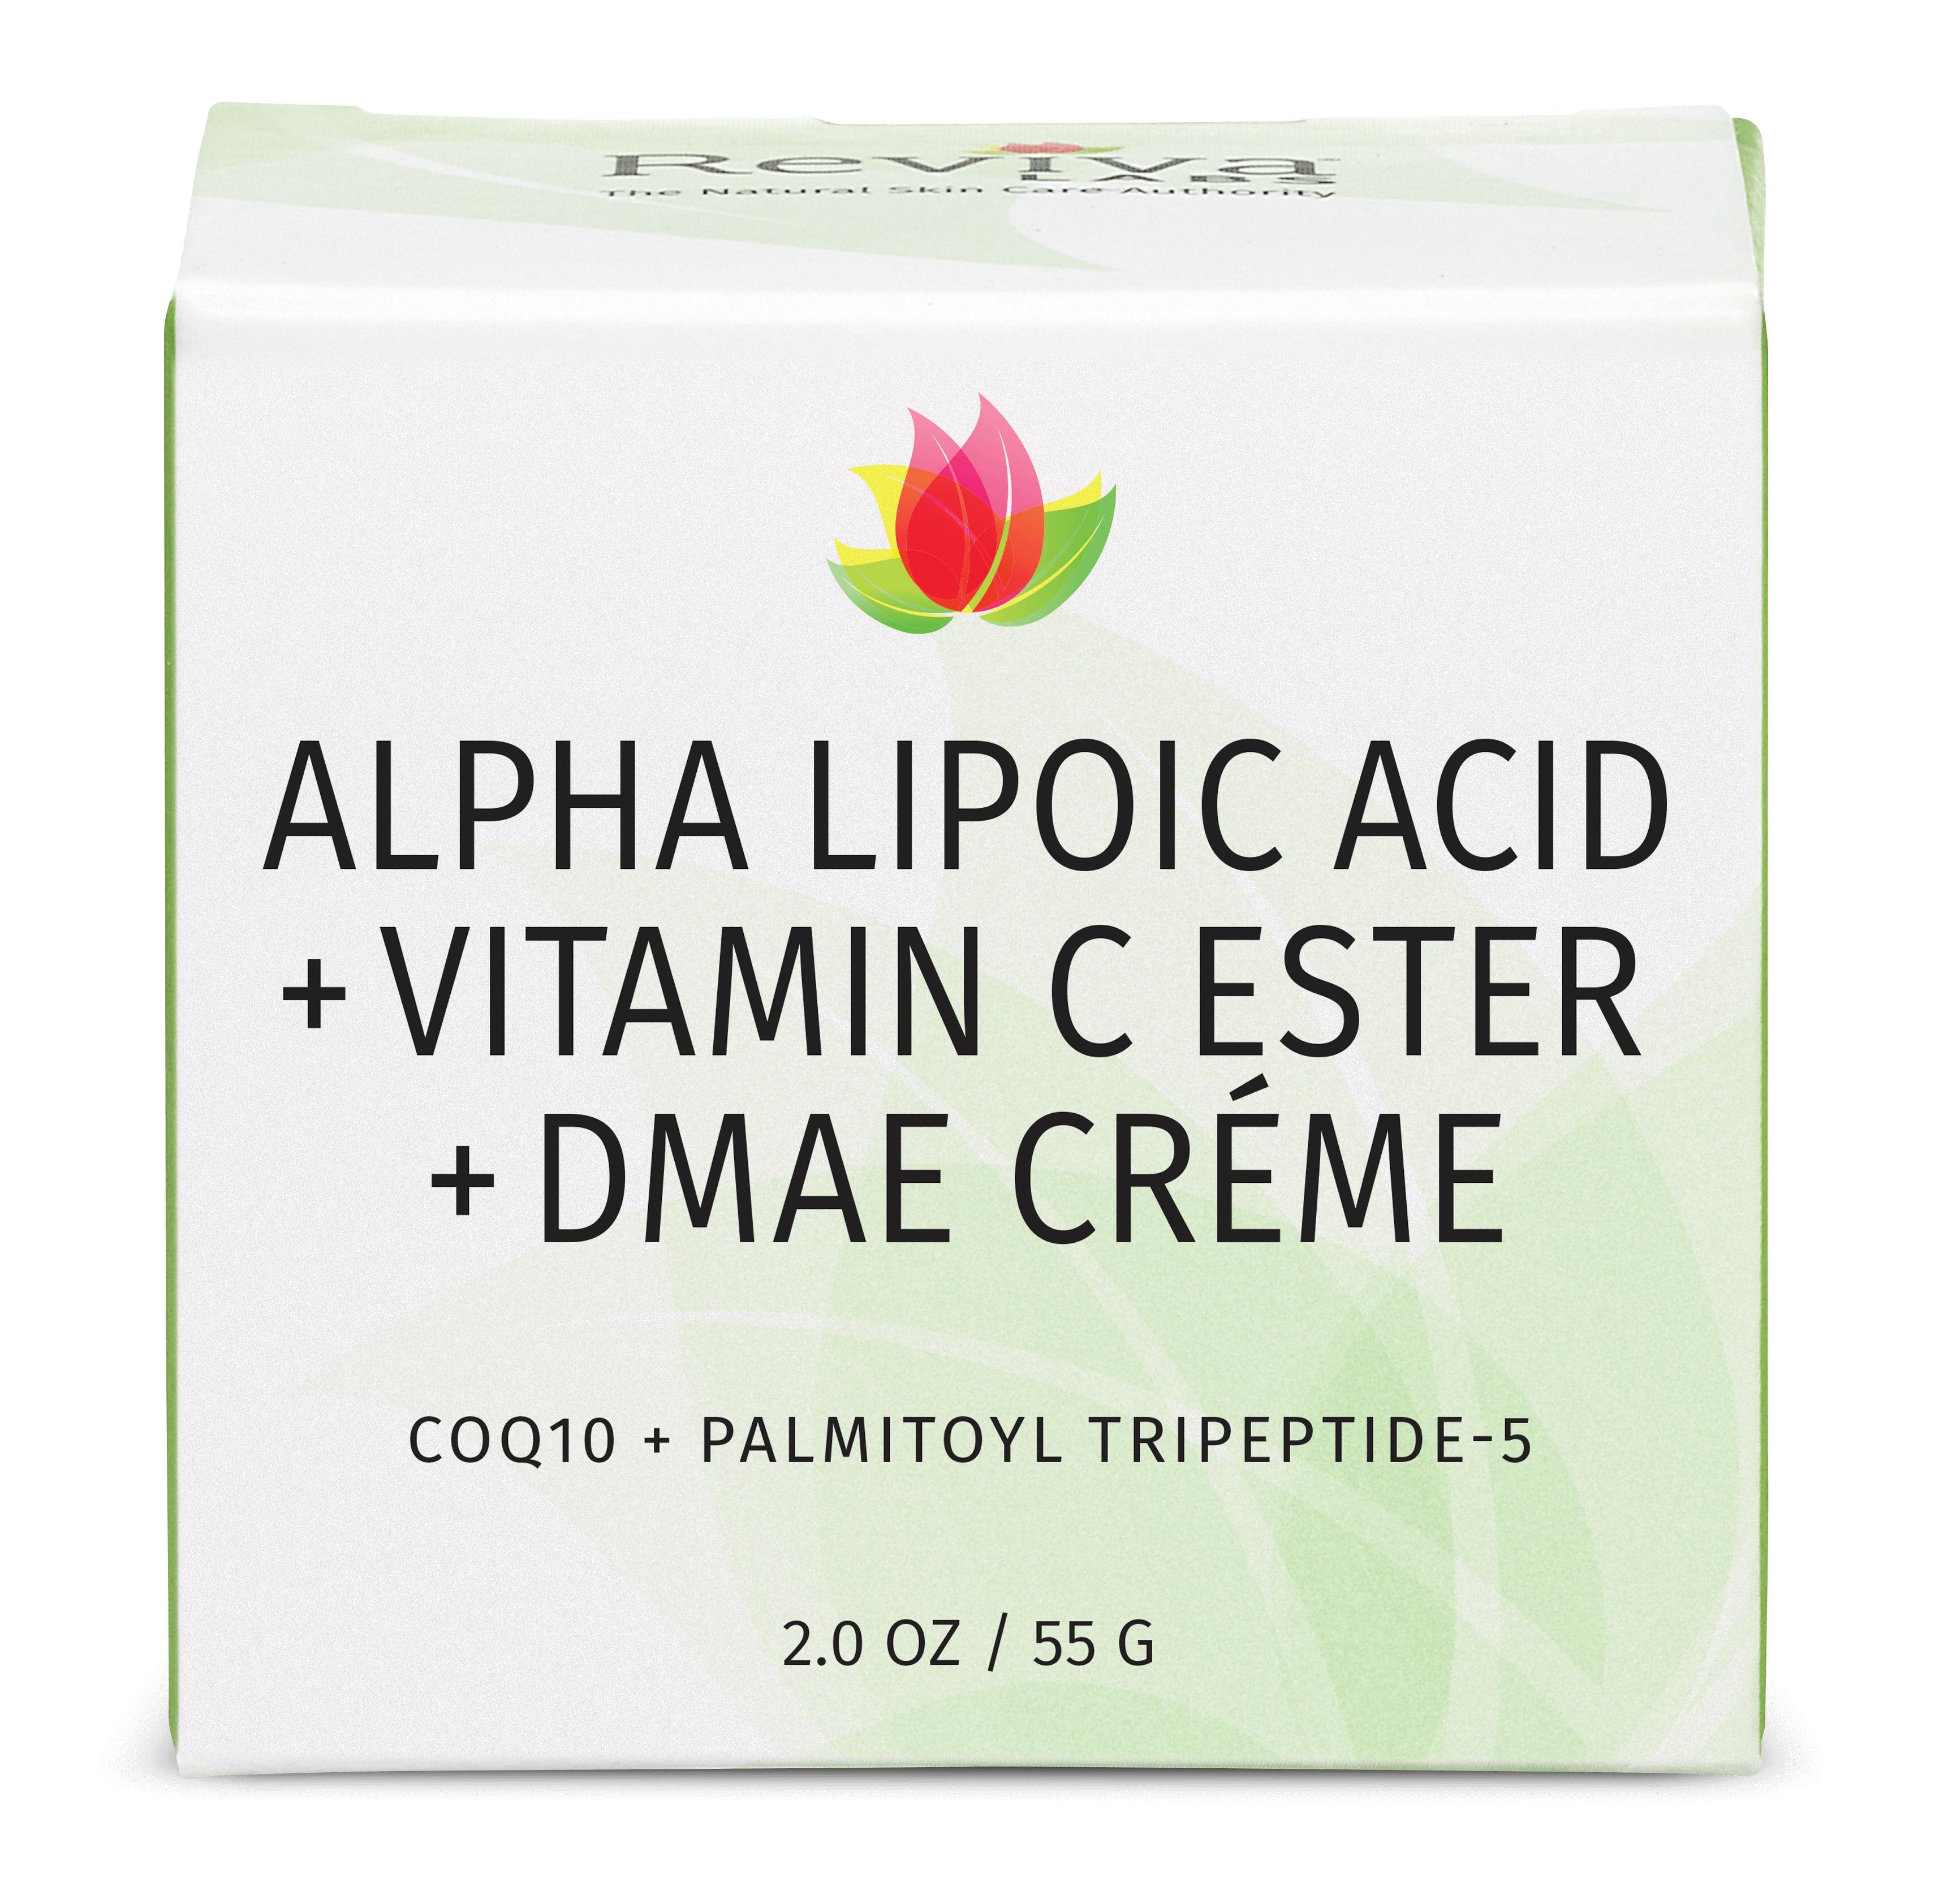 Reviva Labs Alpha Lipoic Acid Vitamin C Ester Dmae Créme